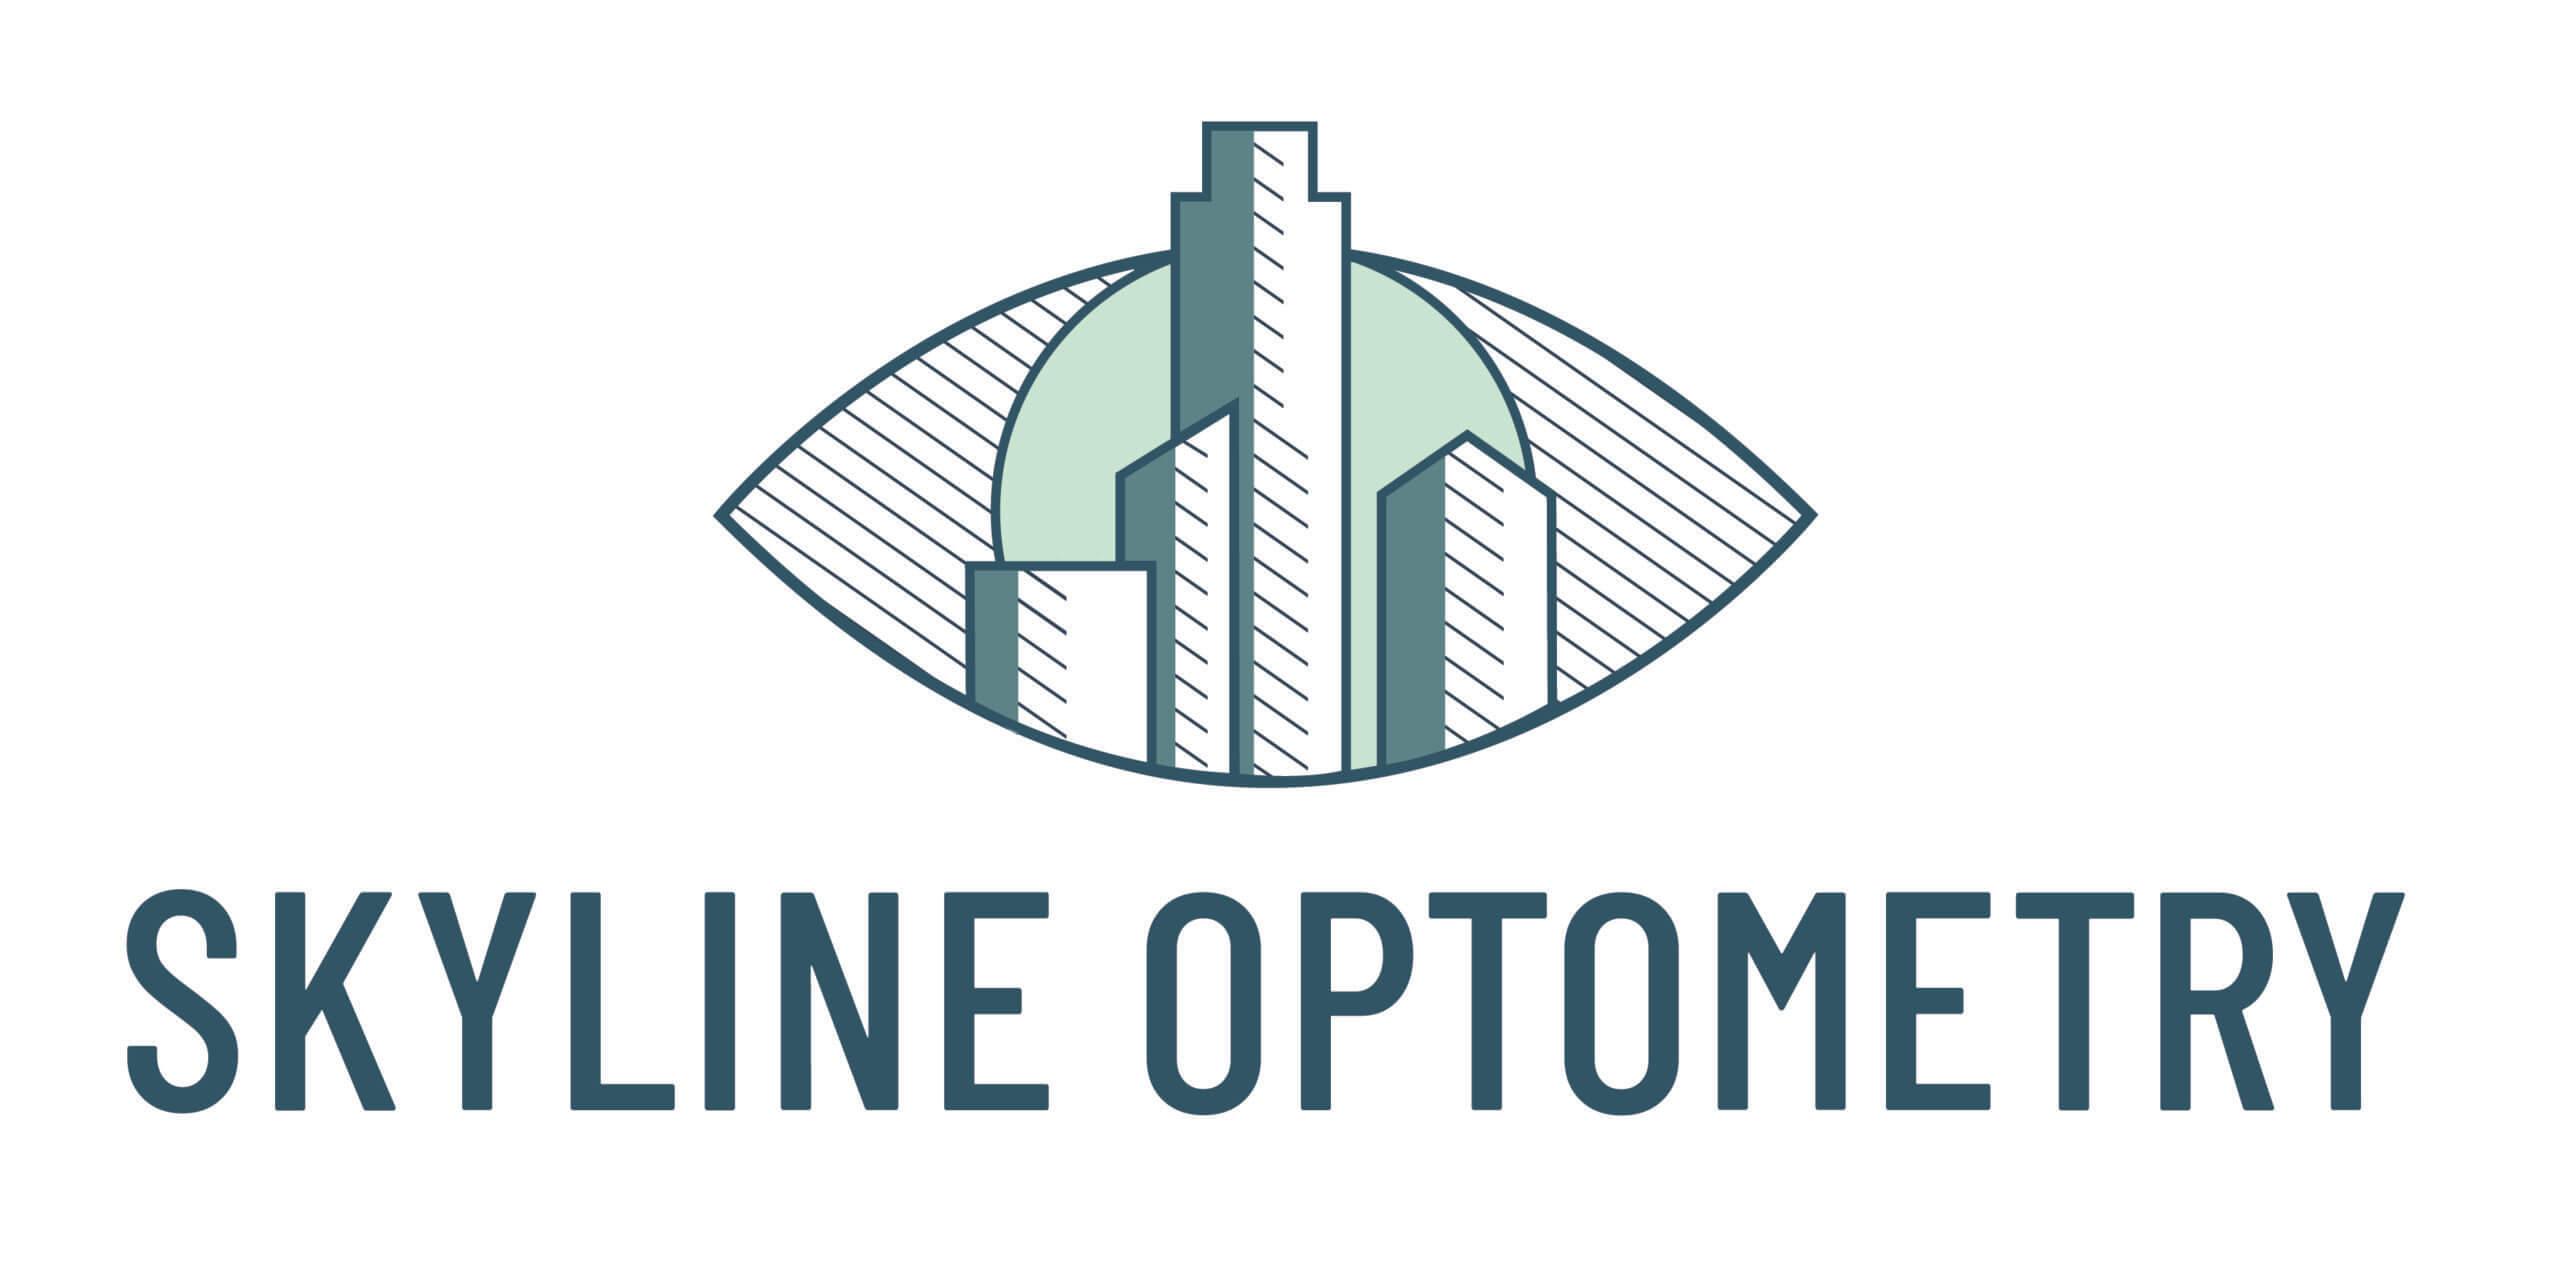 Skyline Optometry